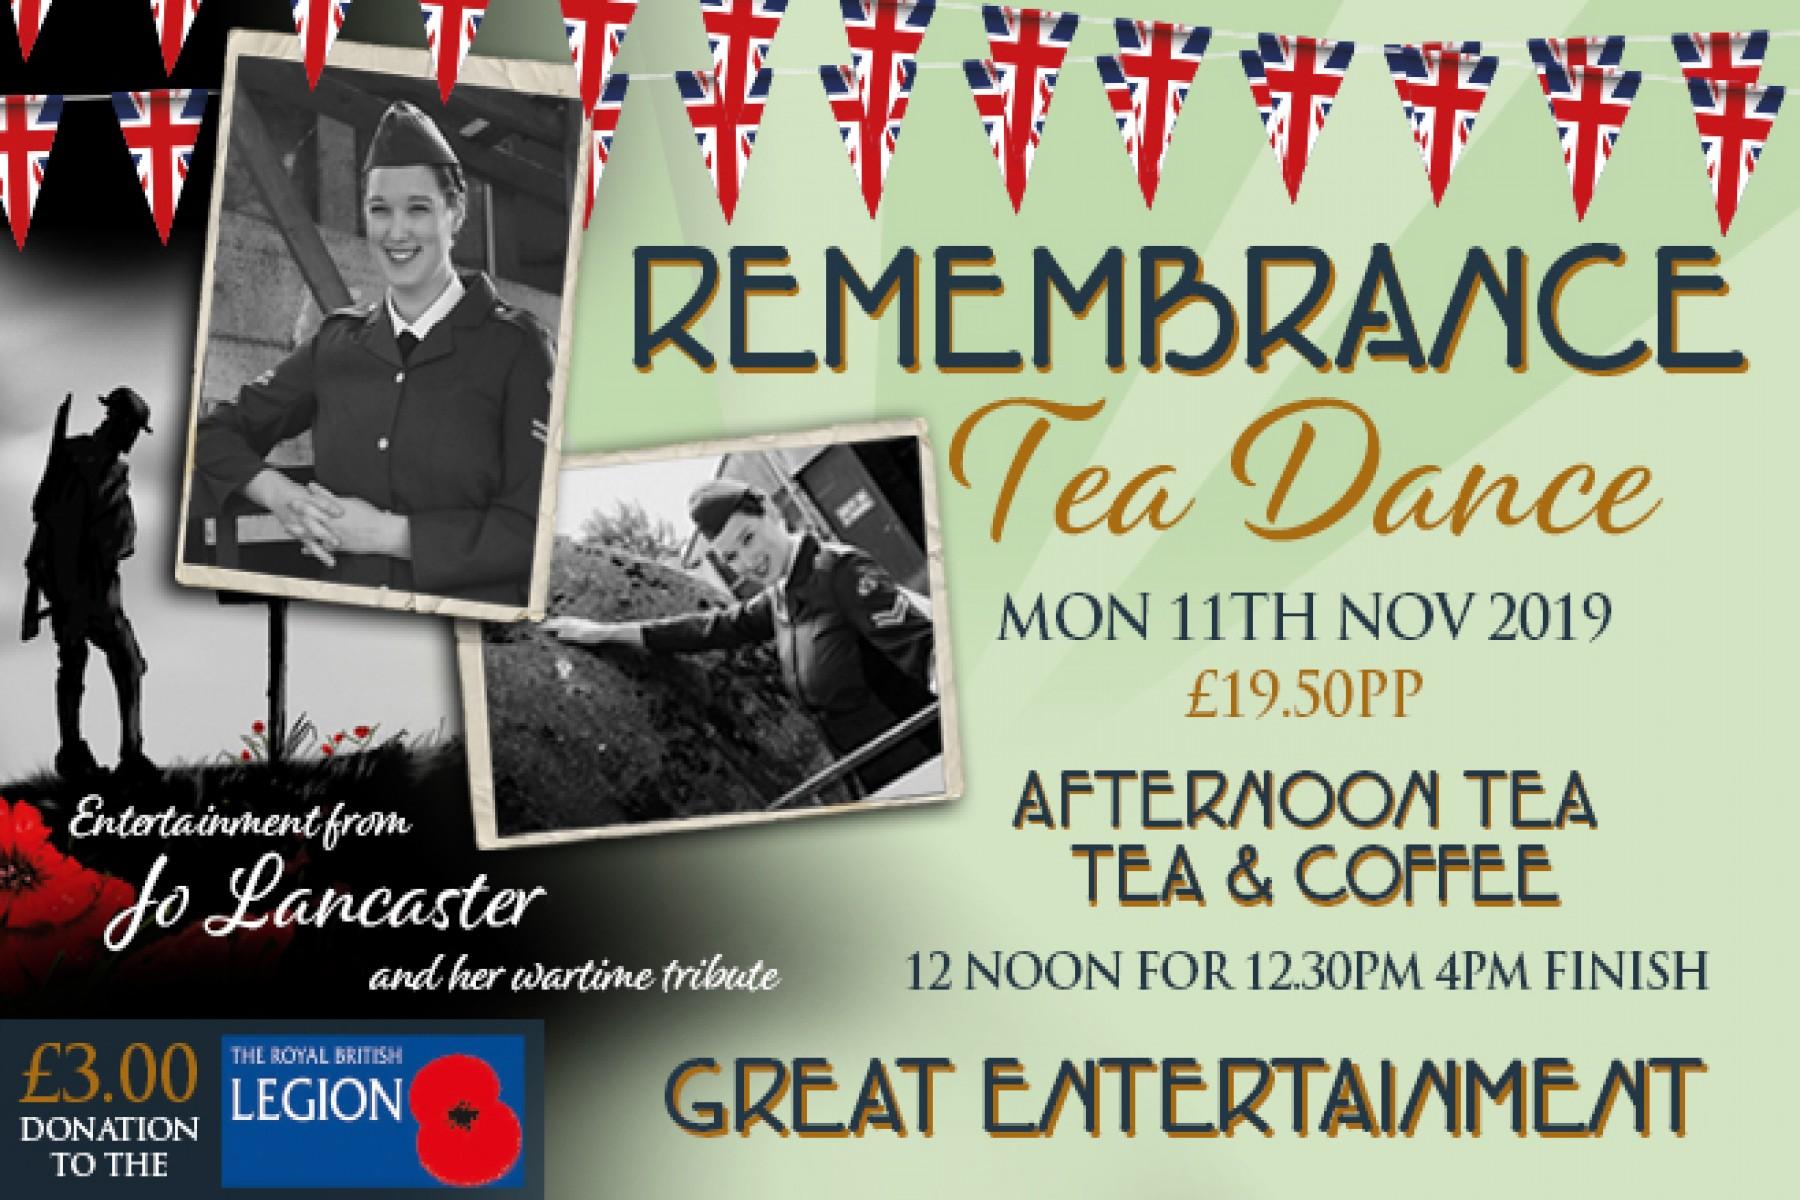 Rememberance Tea Dance (11th November 2019)